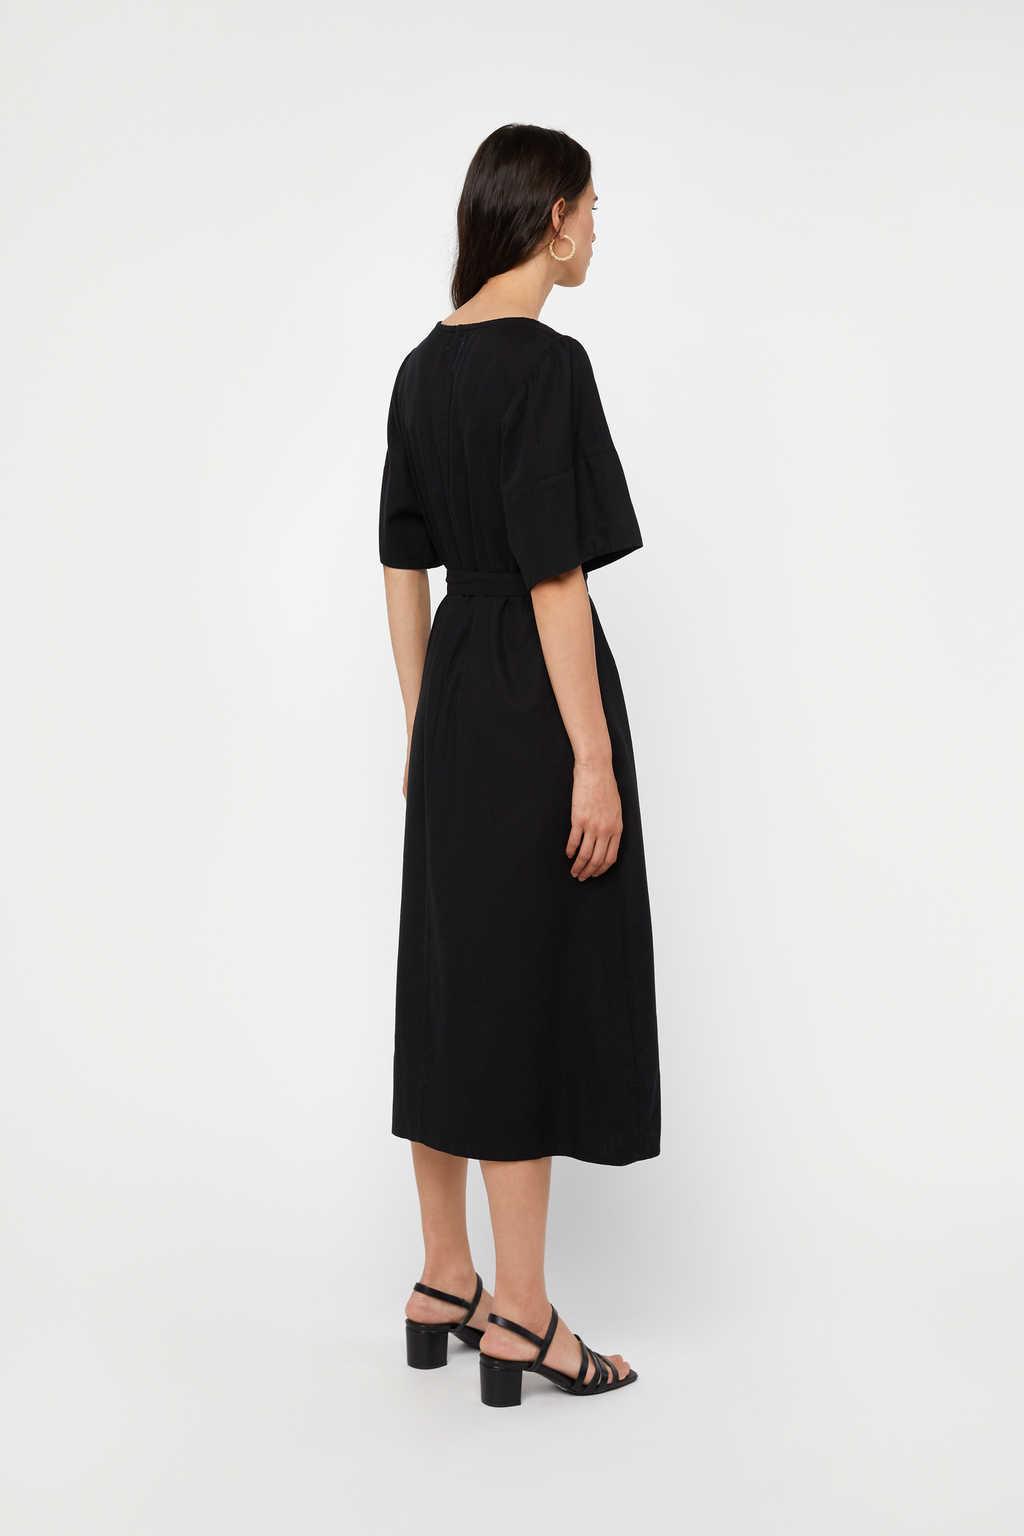 Dress 3263 Black 4